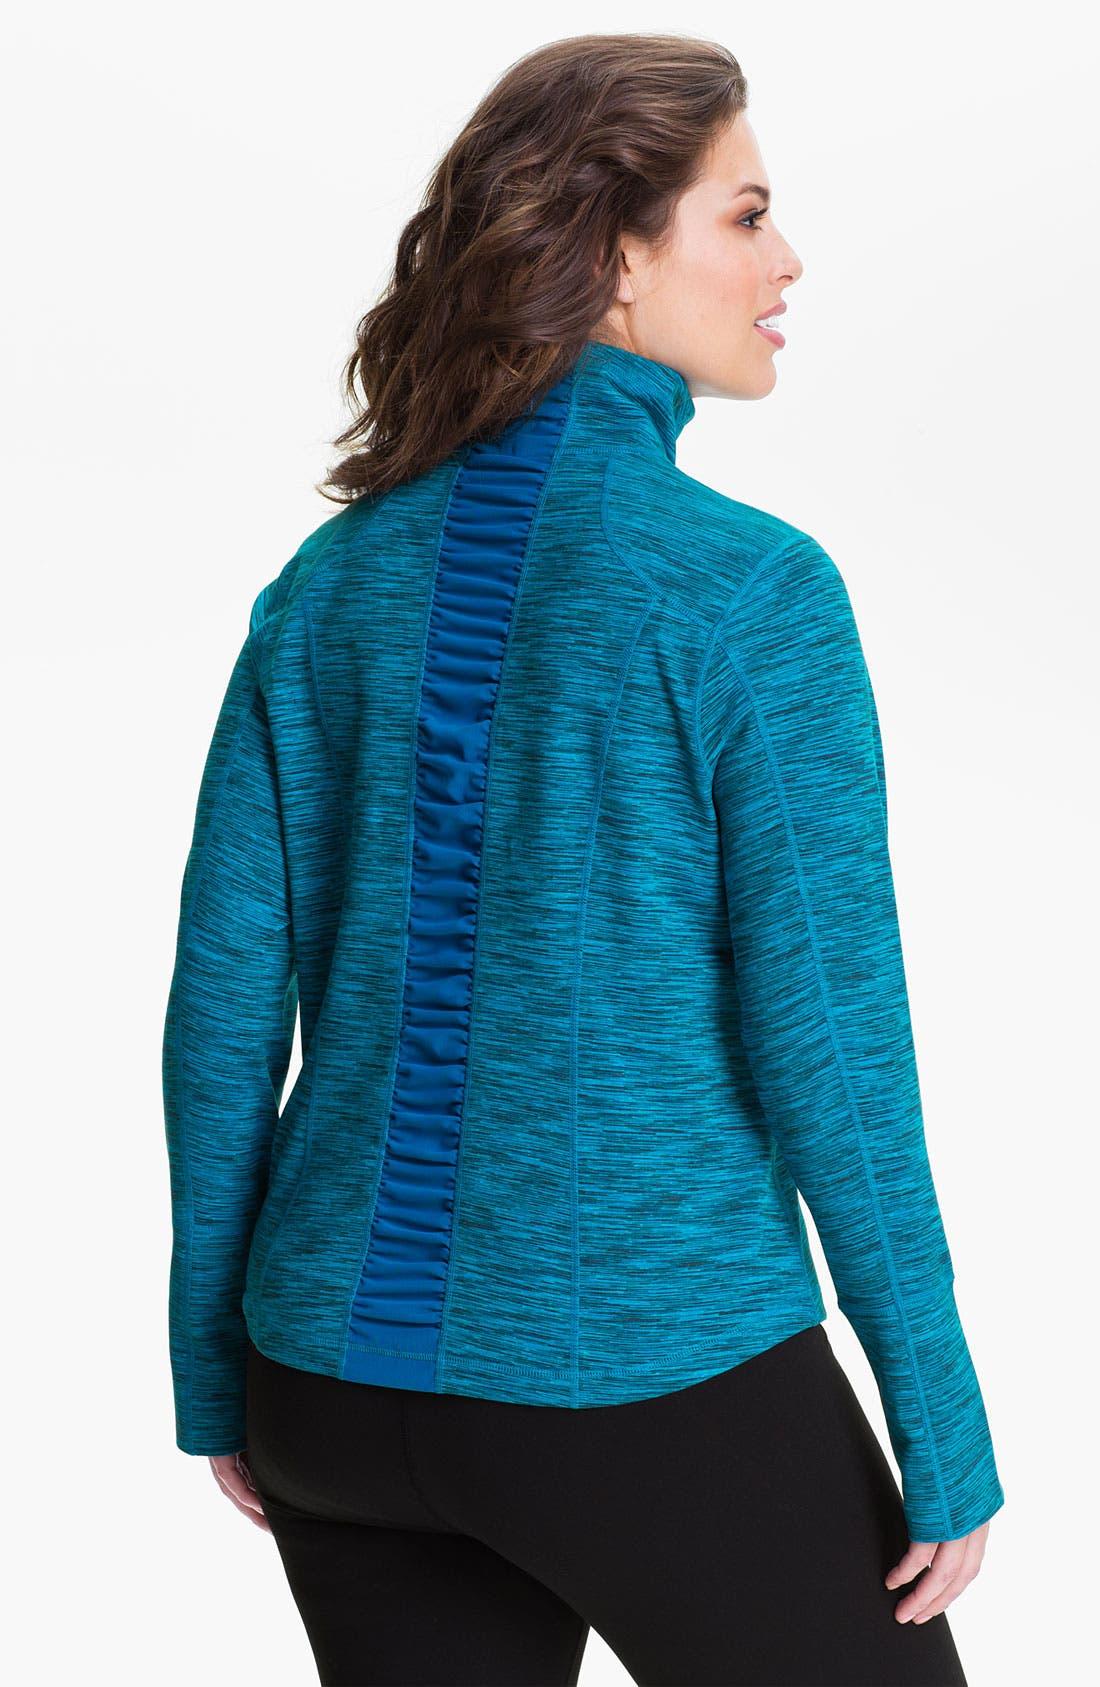 Main Image - Zella 'Sophia' Space Dye Jacket (Plus)